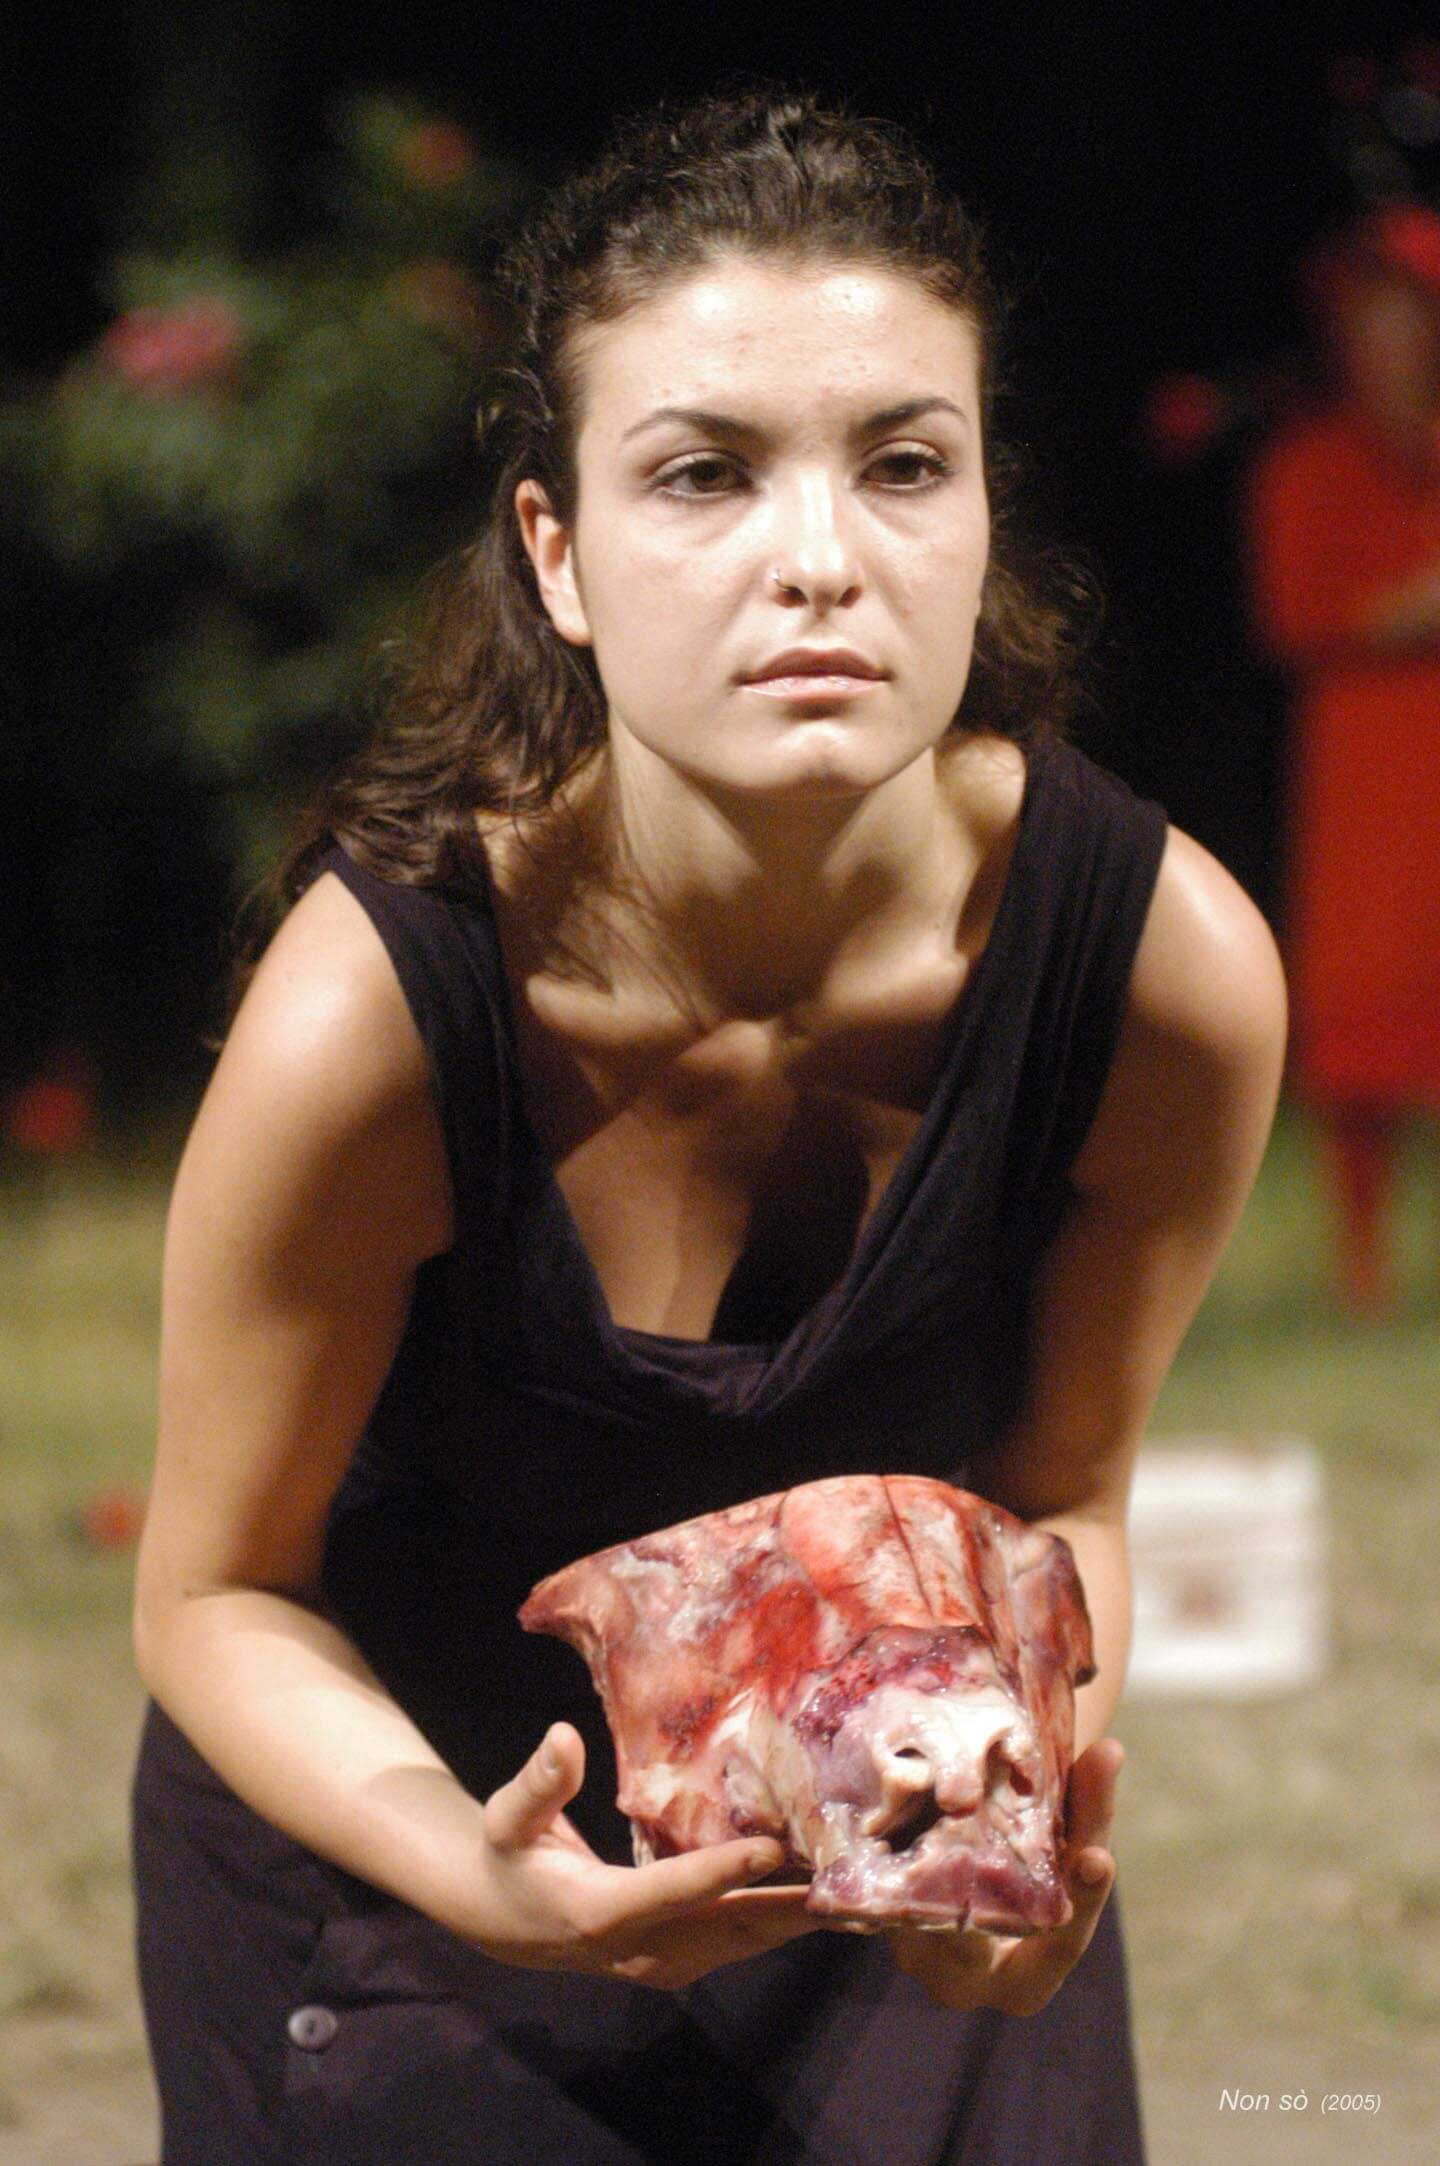 Nonsò;2005;humanbeings (4)